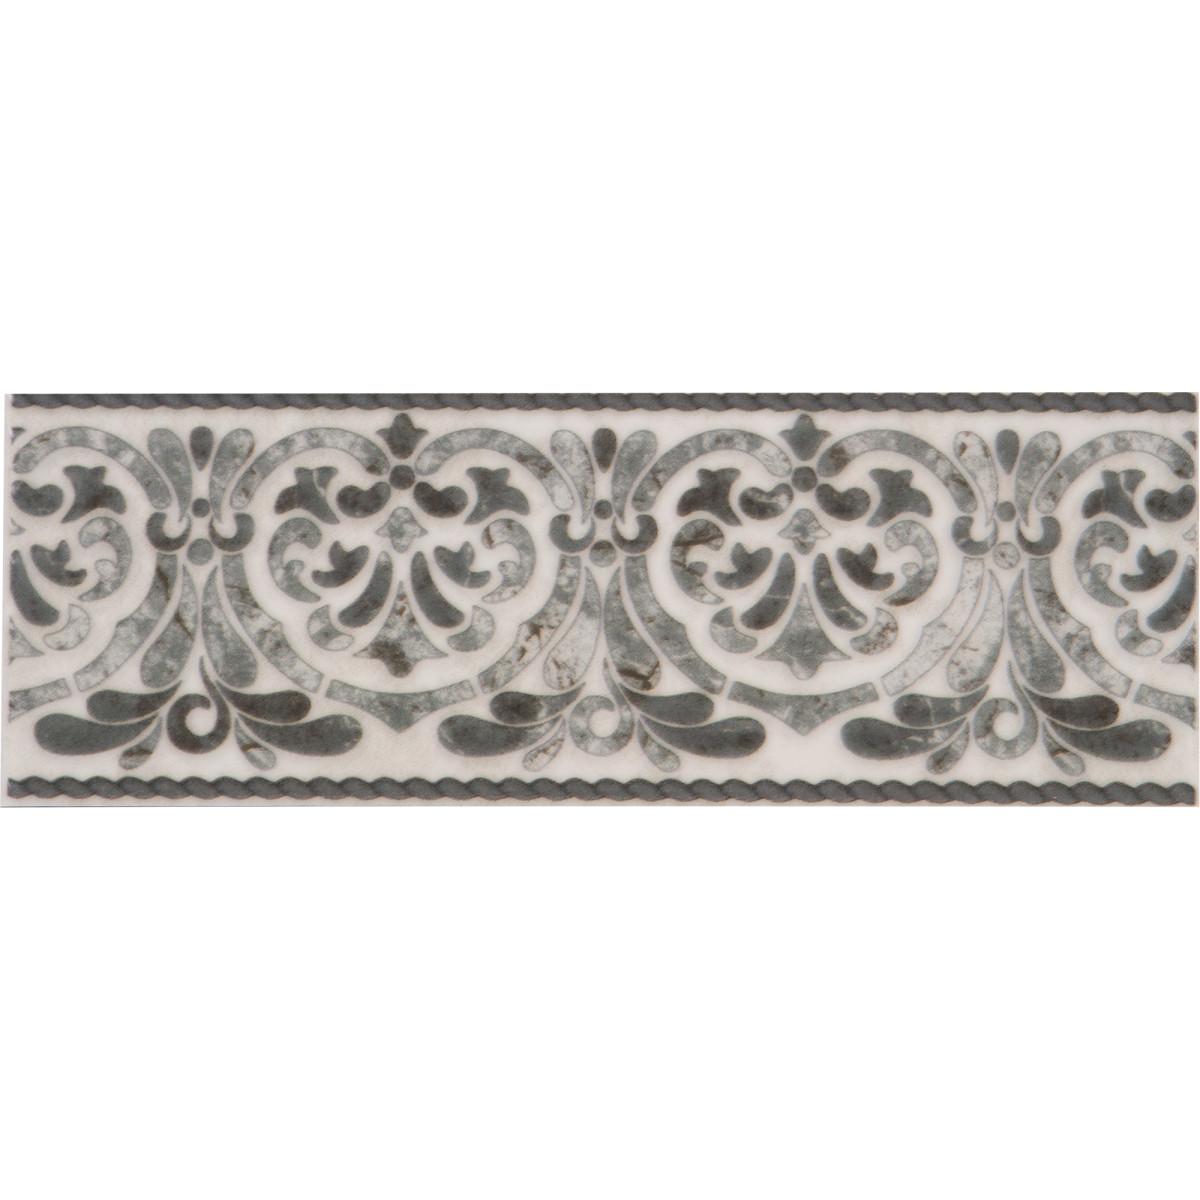 Бордюр настенный «Мрамор» 7x20 см цвет серый